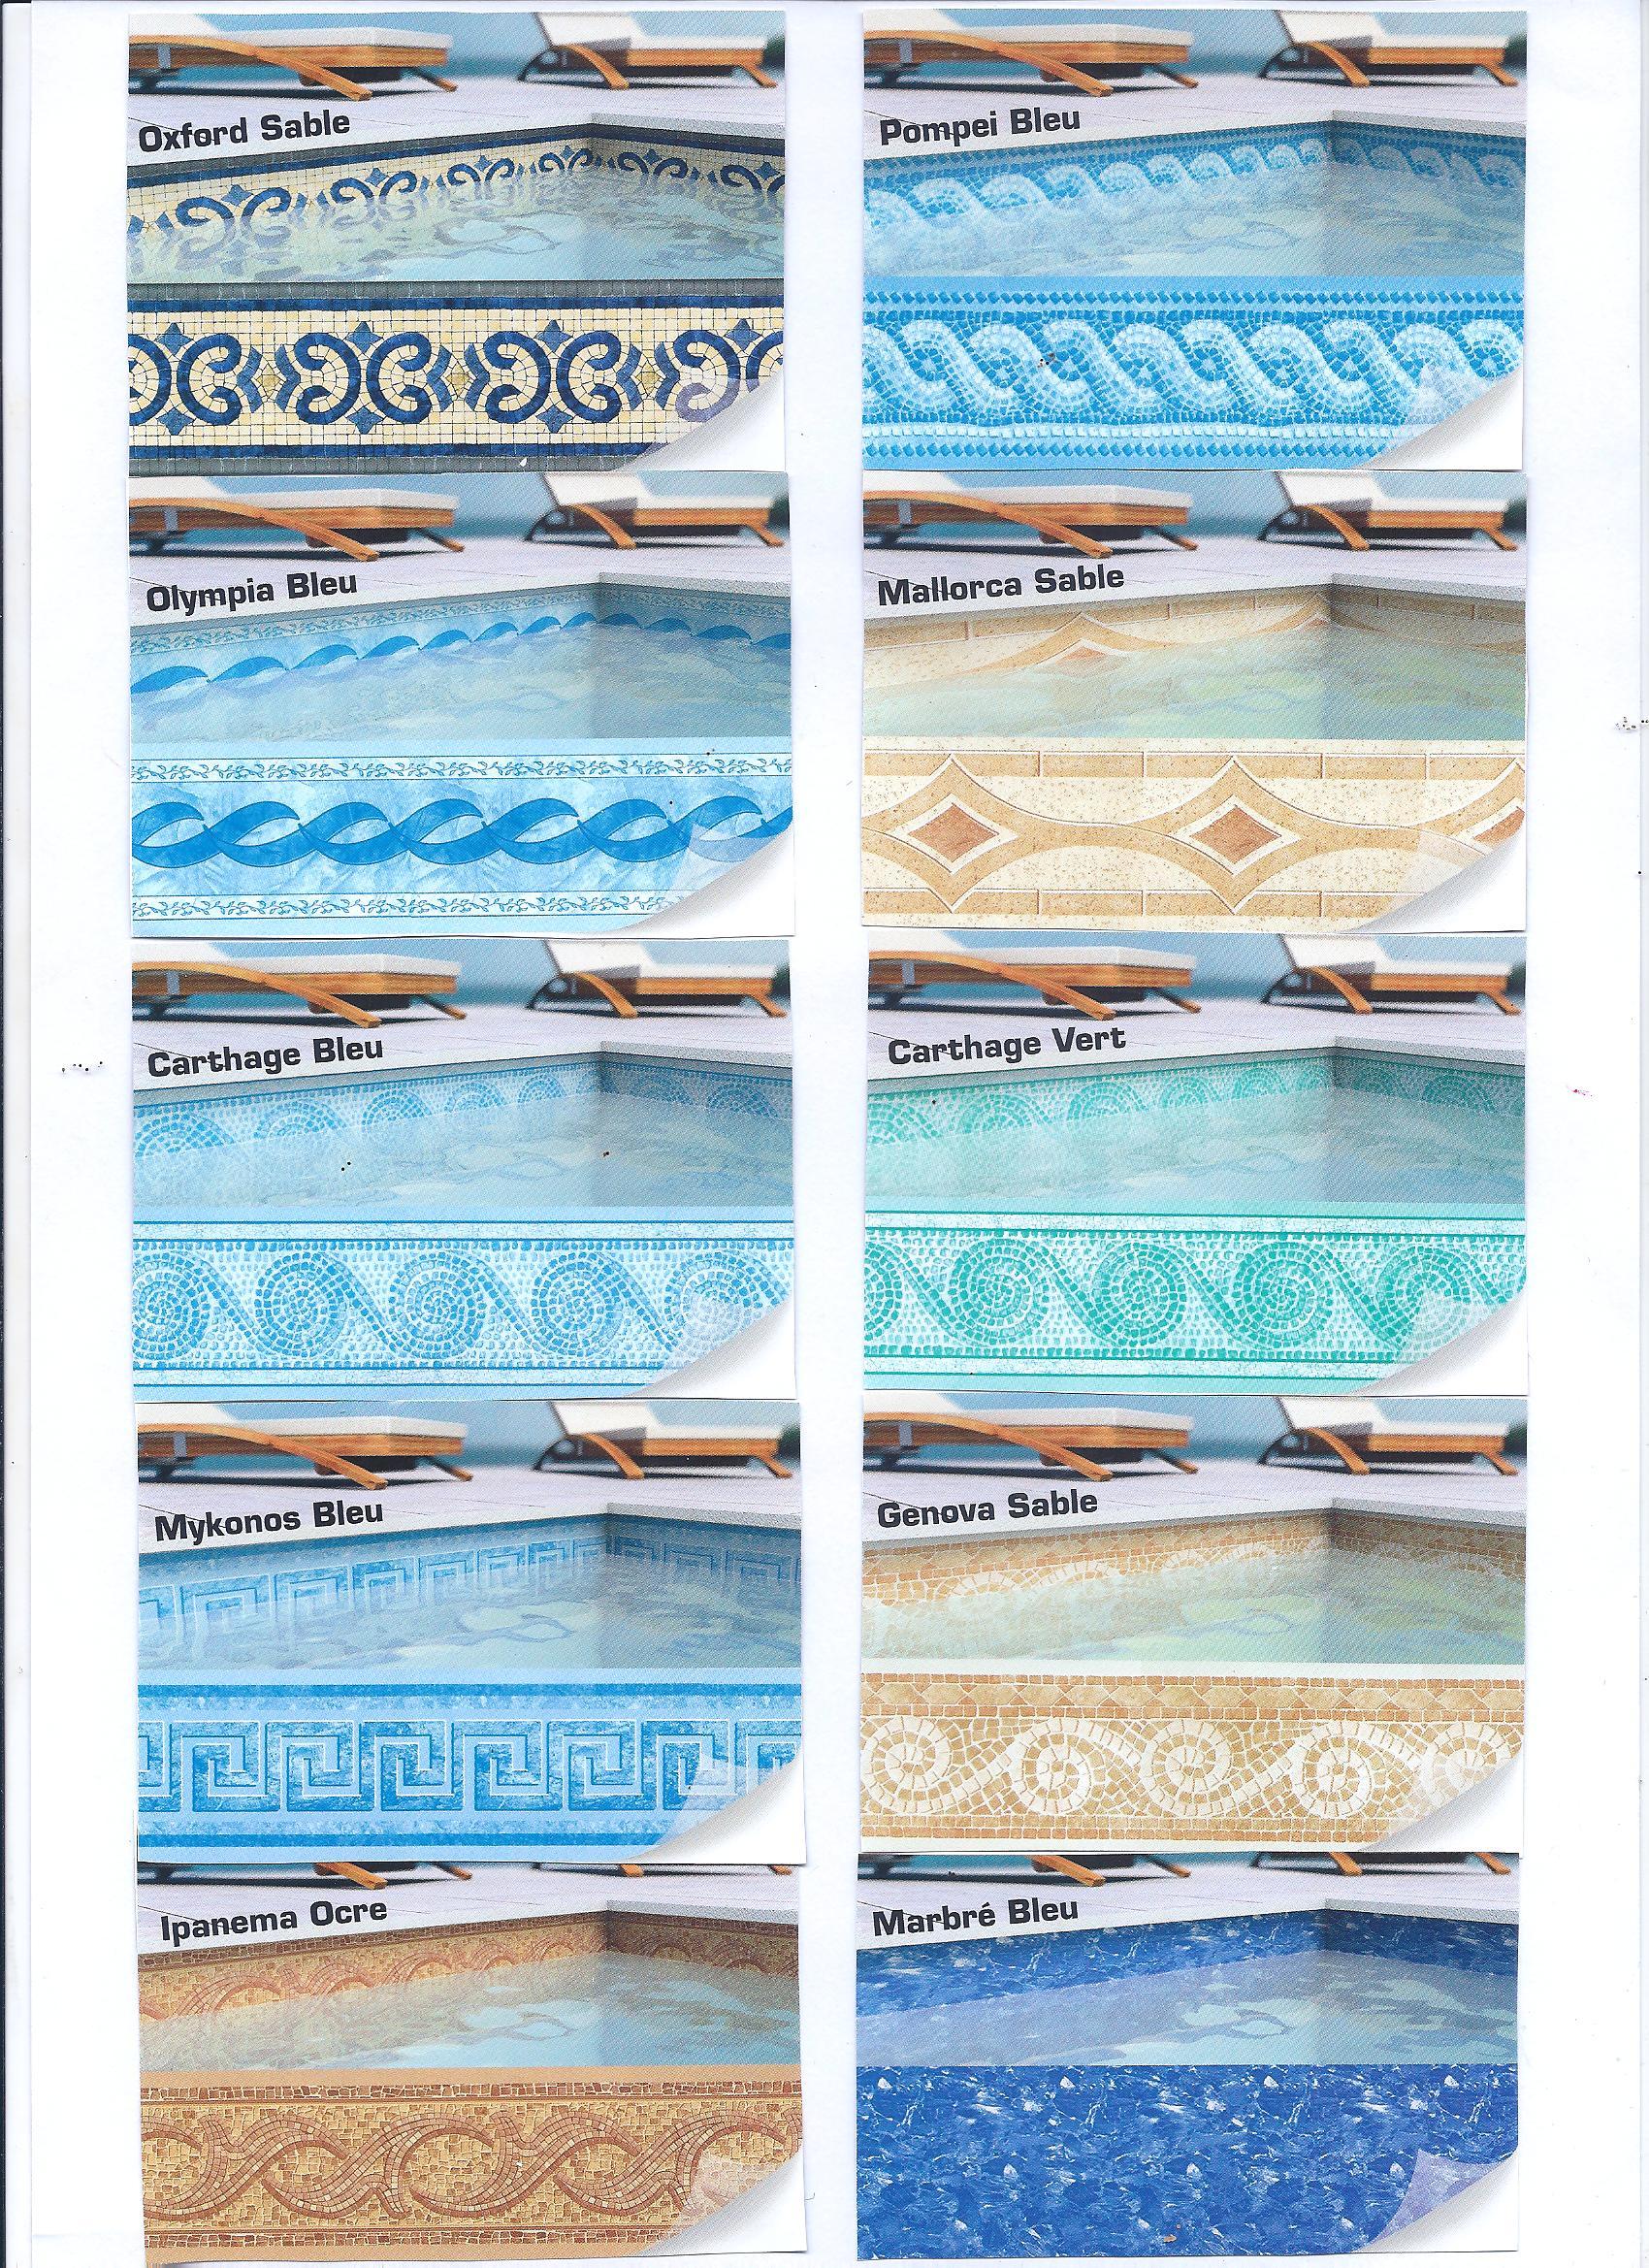 Sps piscine pose et changement de liner piscine alpes for Reparation liner piscine